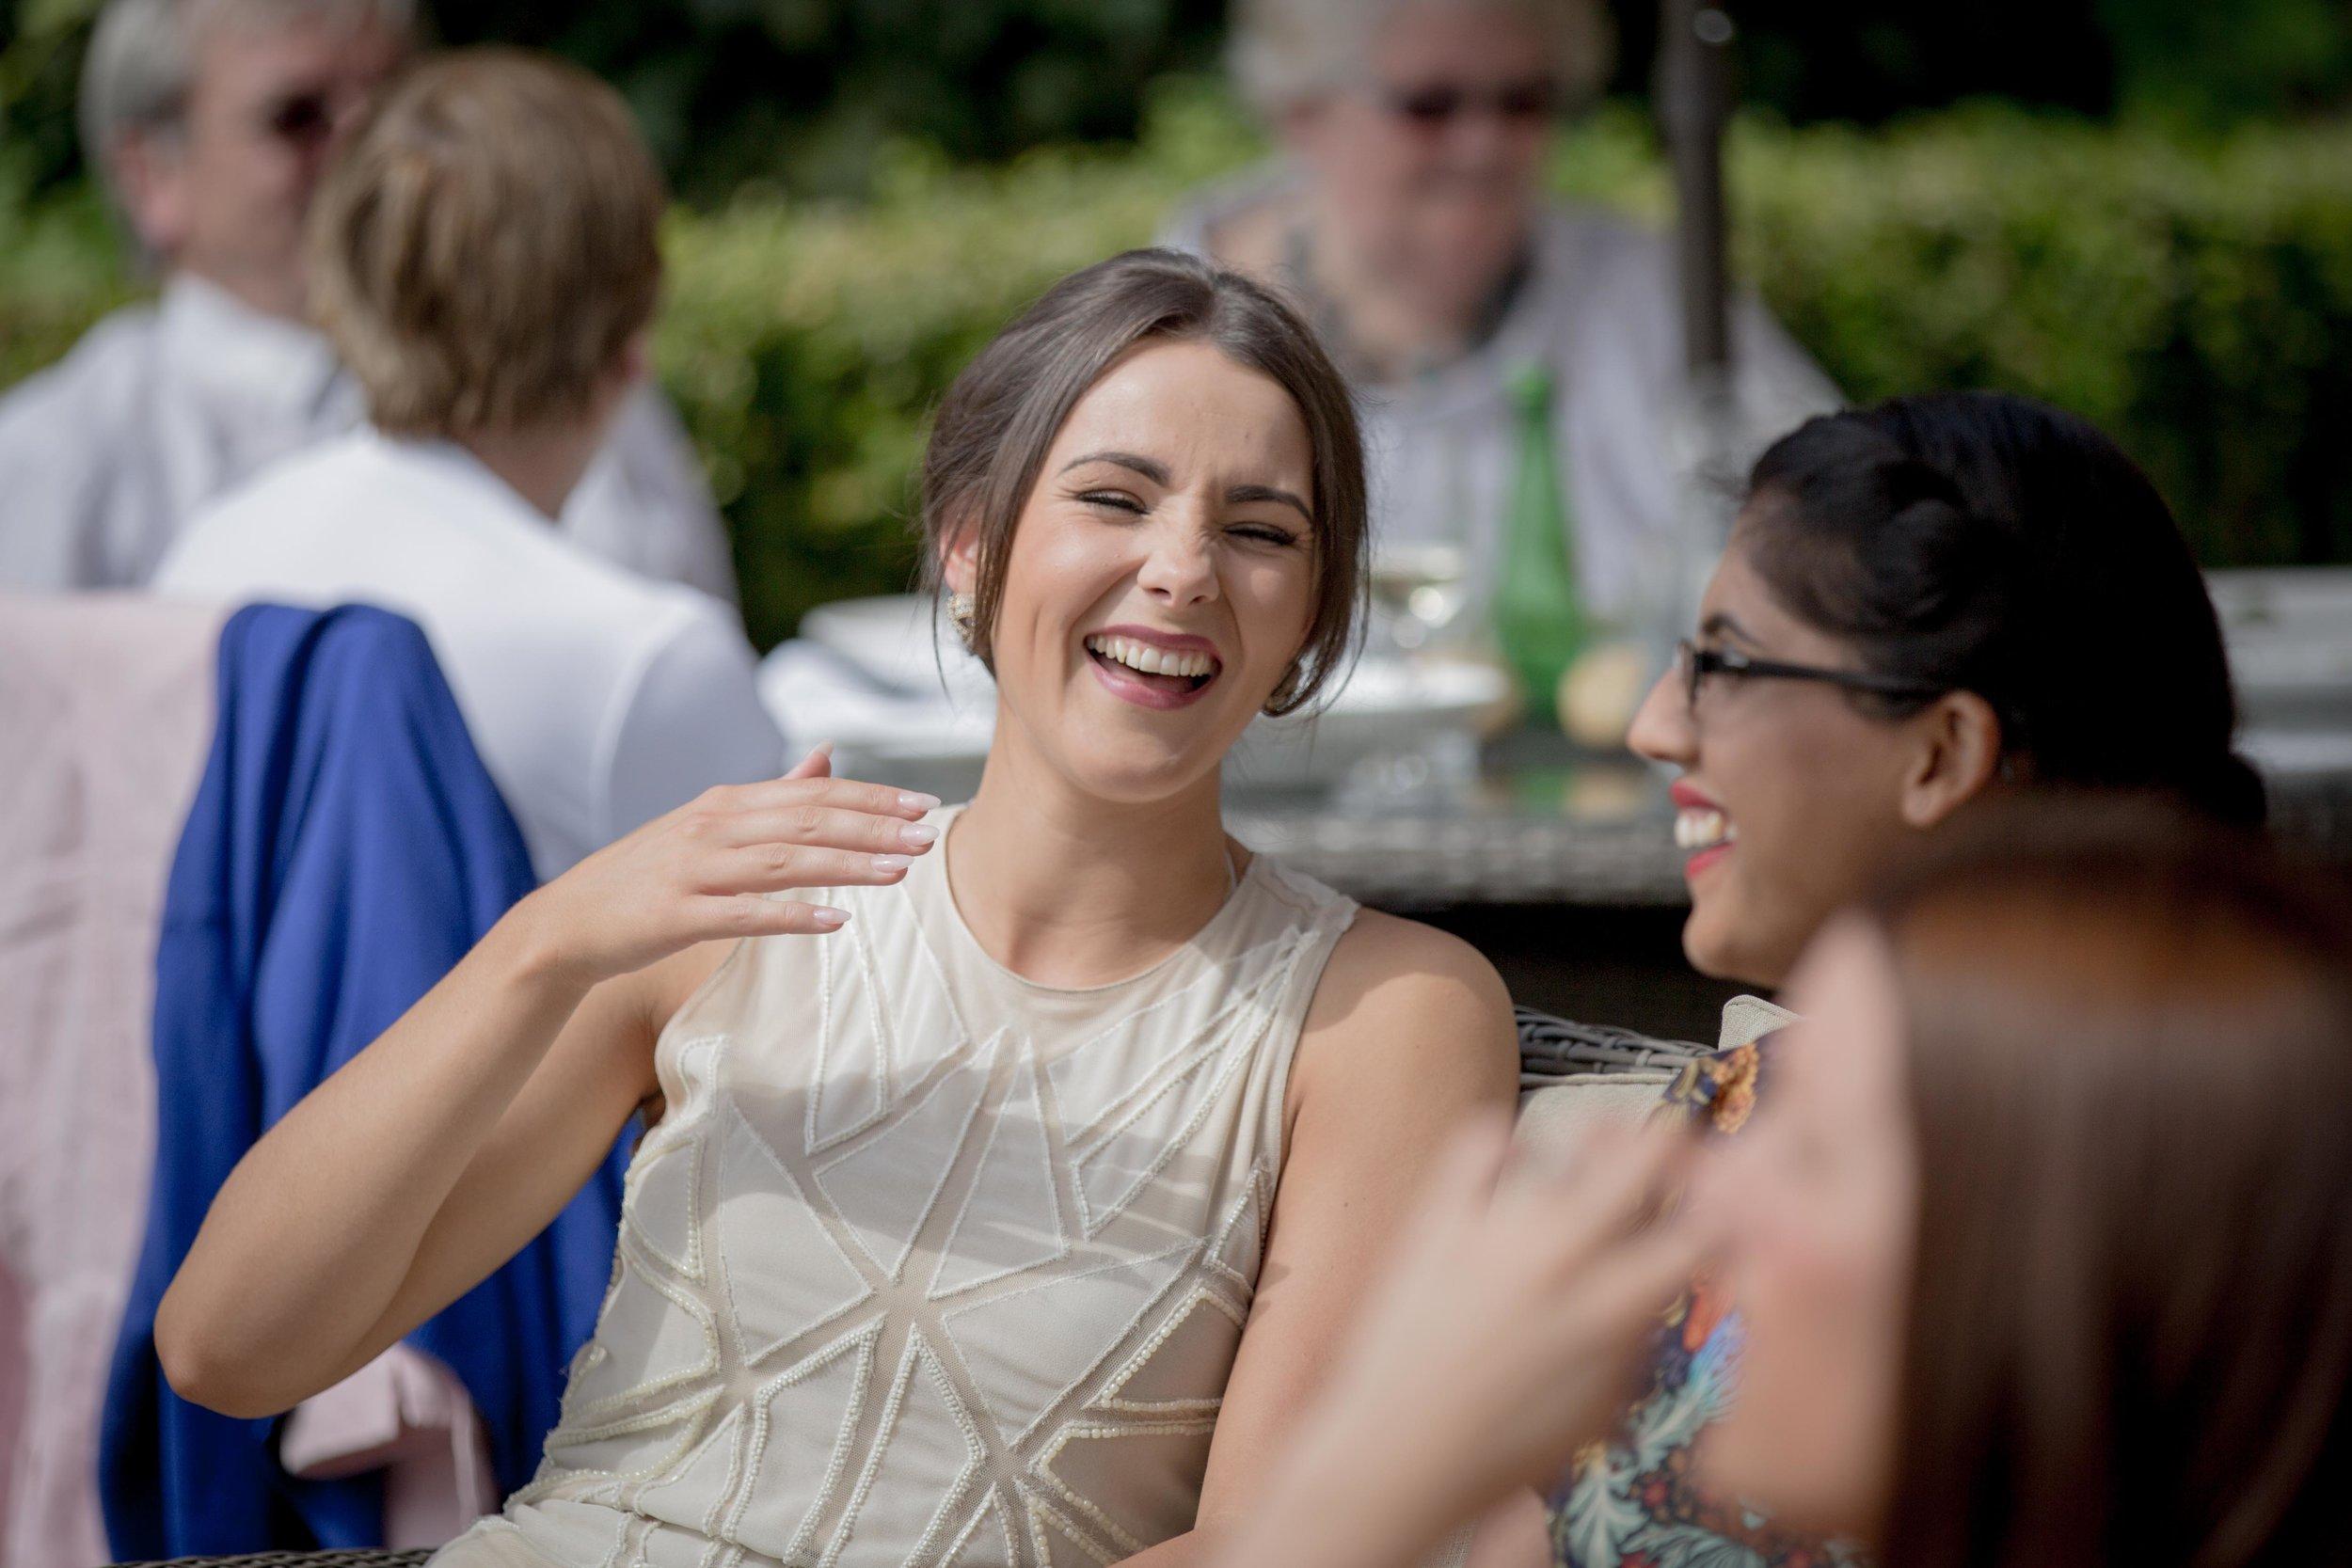 cotswold-wedding-photography-at-stonehouse-court-hotel-natalia-smith-photography-gloucestershire-wedding-photographer-52.jpg